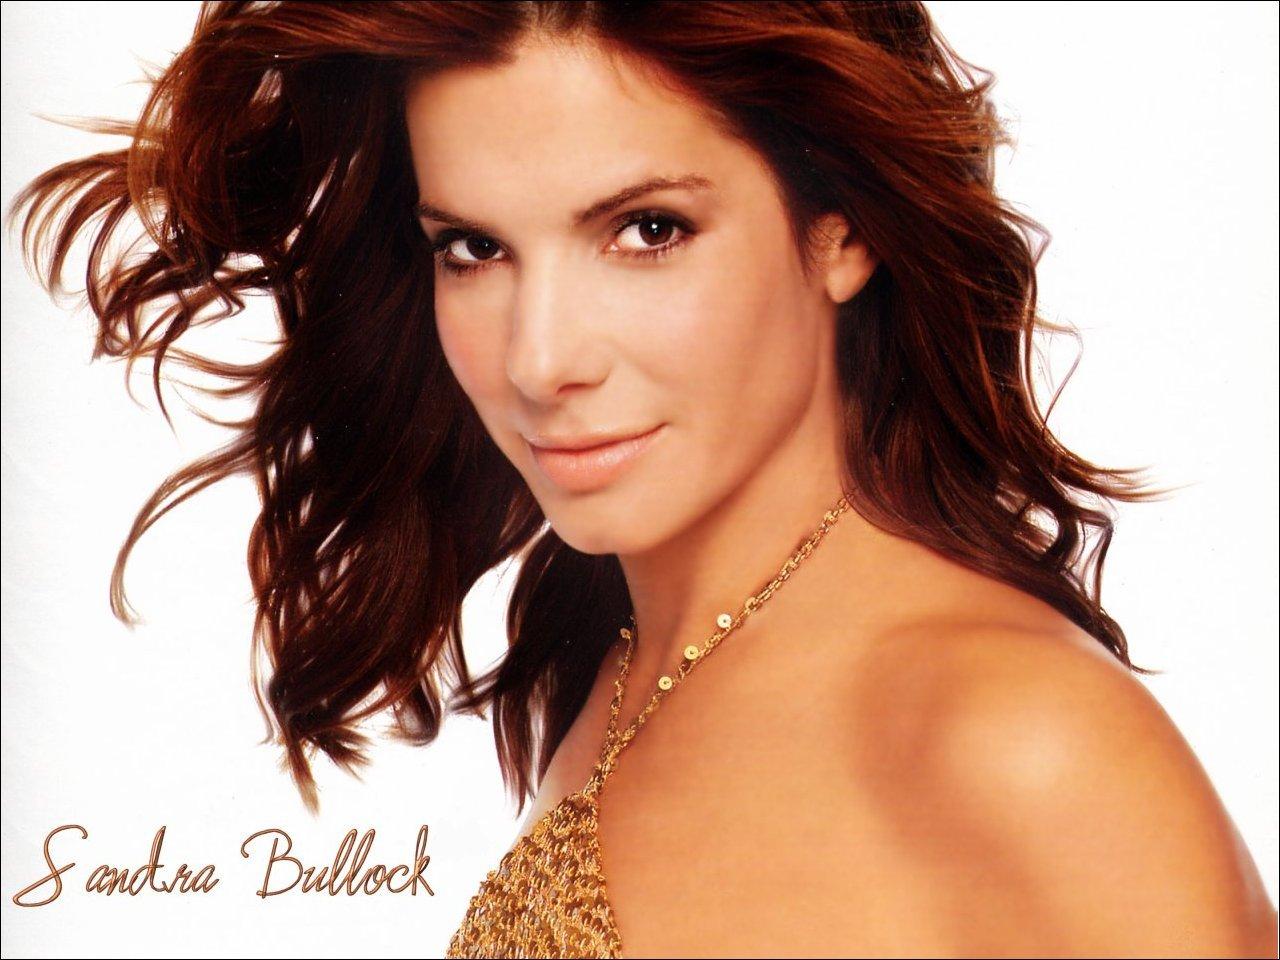 Hairstyles Name 2012 Sandra Bullock Hd Wallpapers